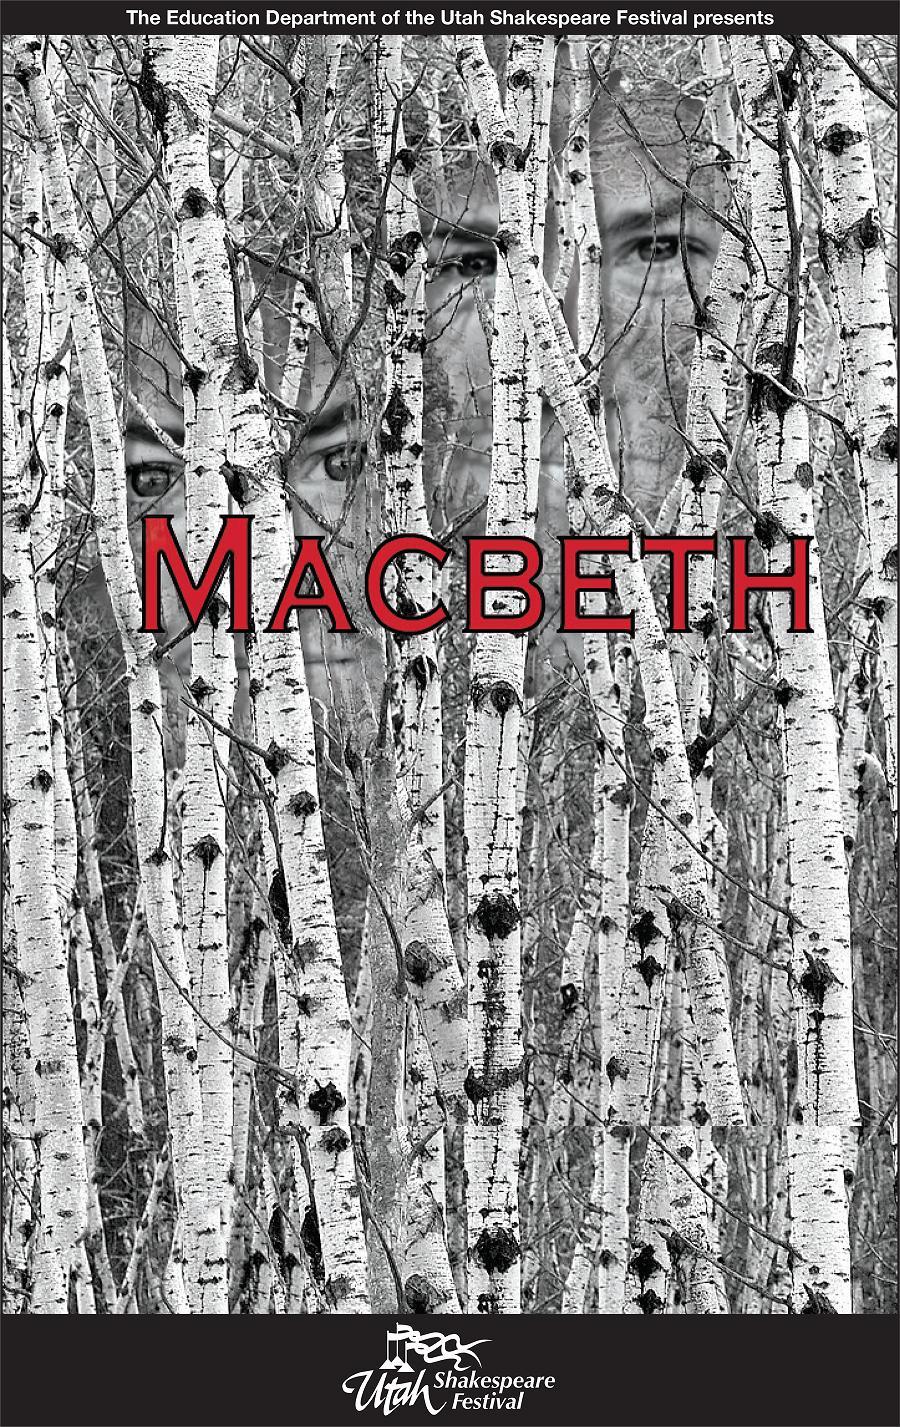 Macbeth coming to VVHS next week